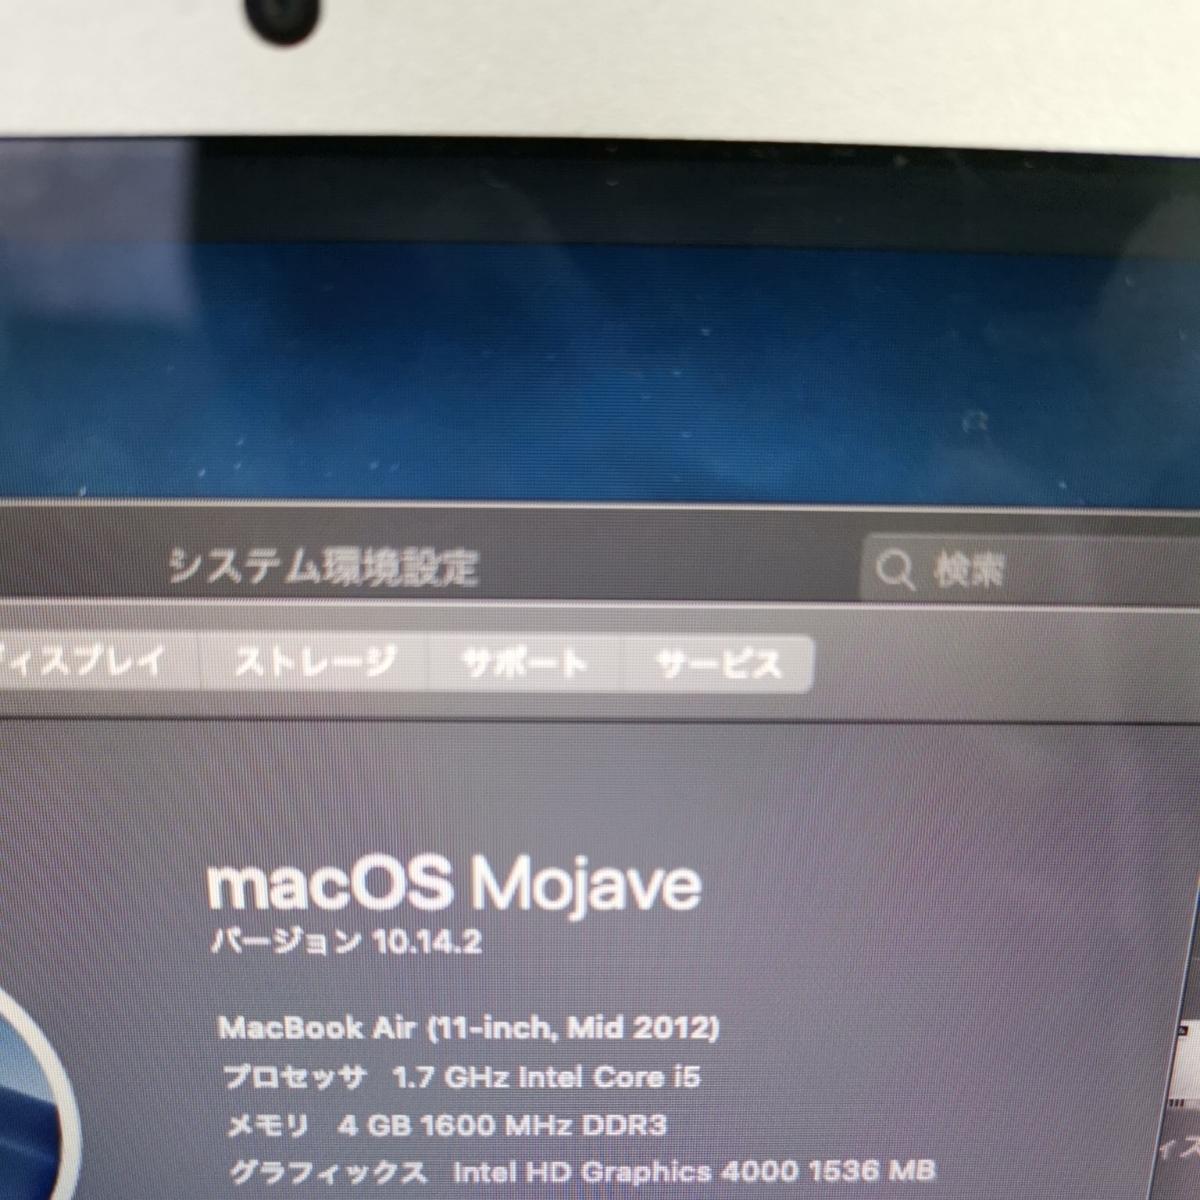 Apple MacBook Air 11インチ 2012 i5 4GB 128GB Mojave 動作確認済み 美品 Mac アップル SSD_画像3